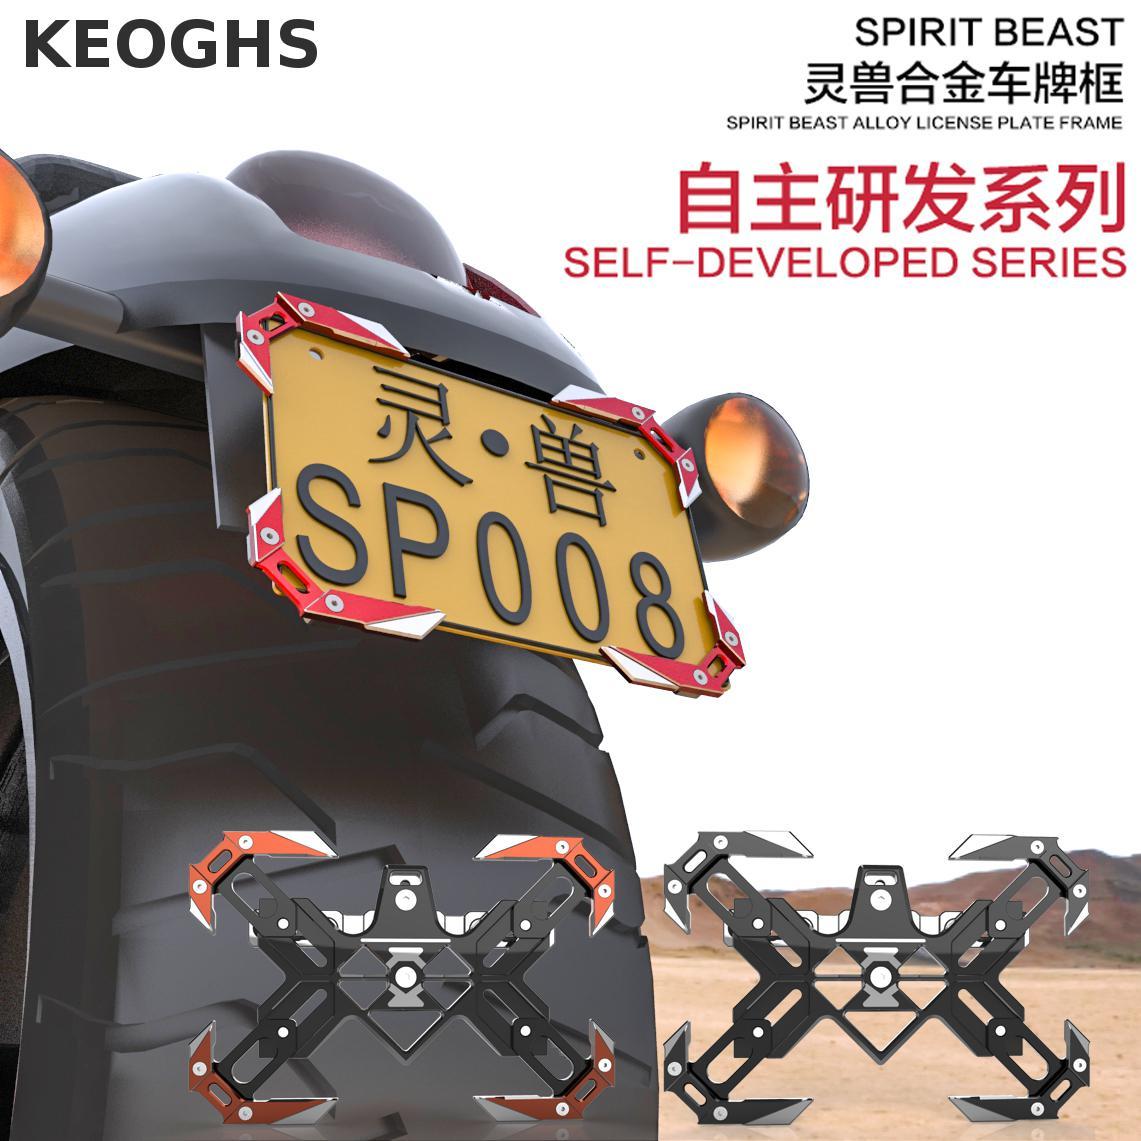 Keoghs Motorcycle Creative Cnc License Plate Frame High Quality Adjustable Universal For Honda Kawasaki Yamaha Suzuki Ktm Bmw keoghs real adelin 260mm floating brake disc high quality for yamaha scooter cygnus modify